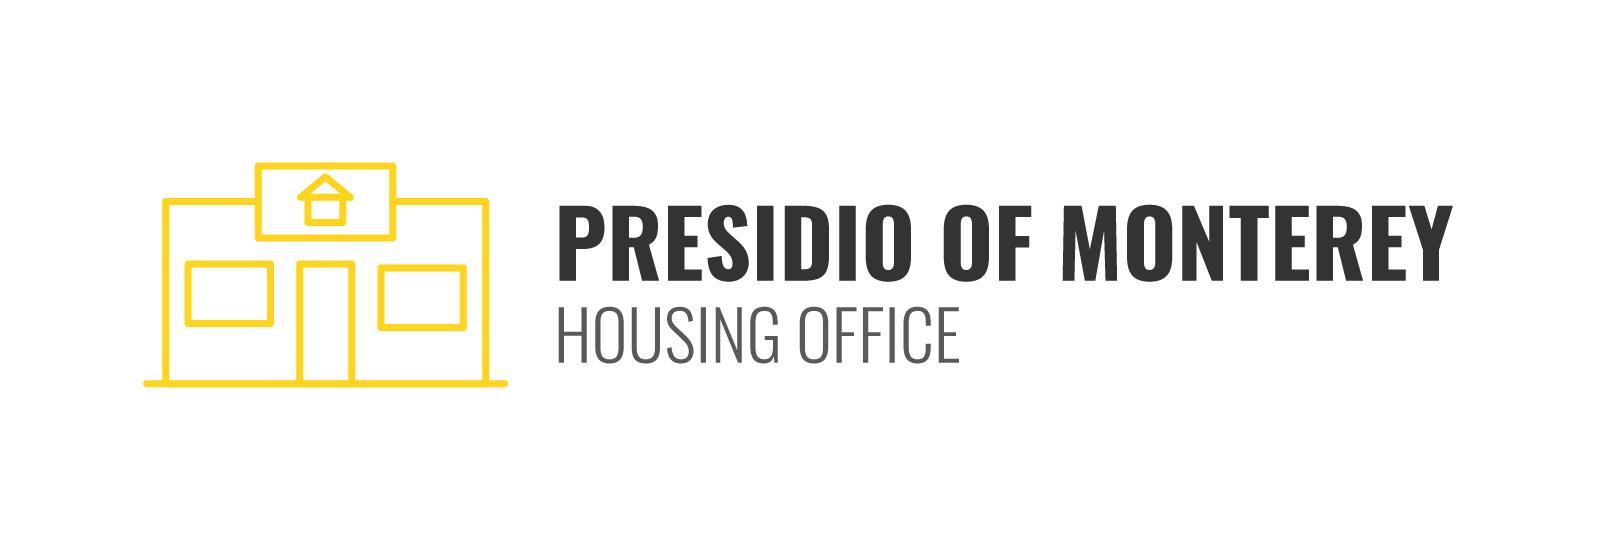 Presidio of Monterey Housing Office